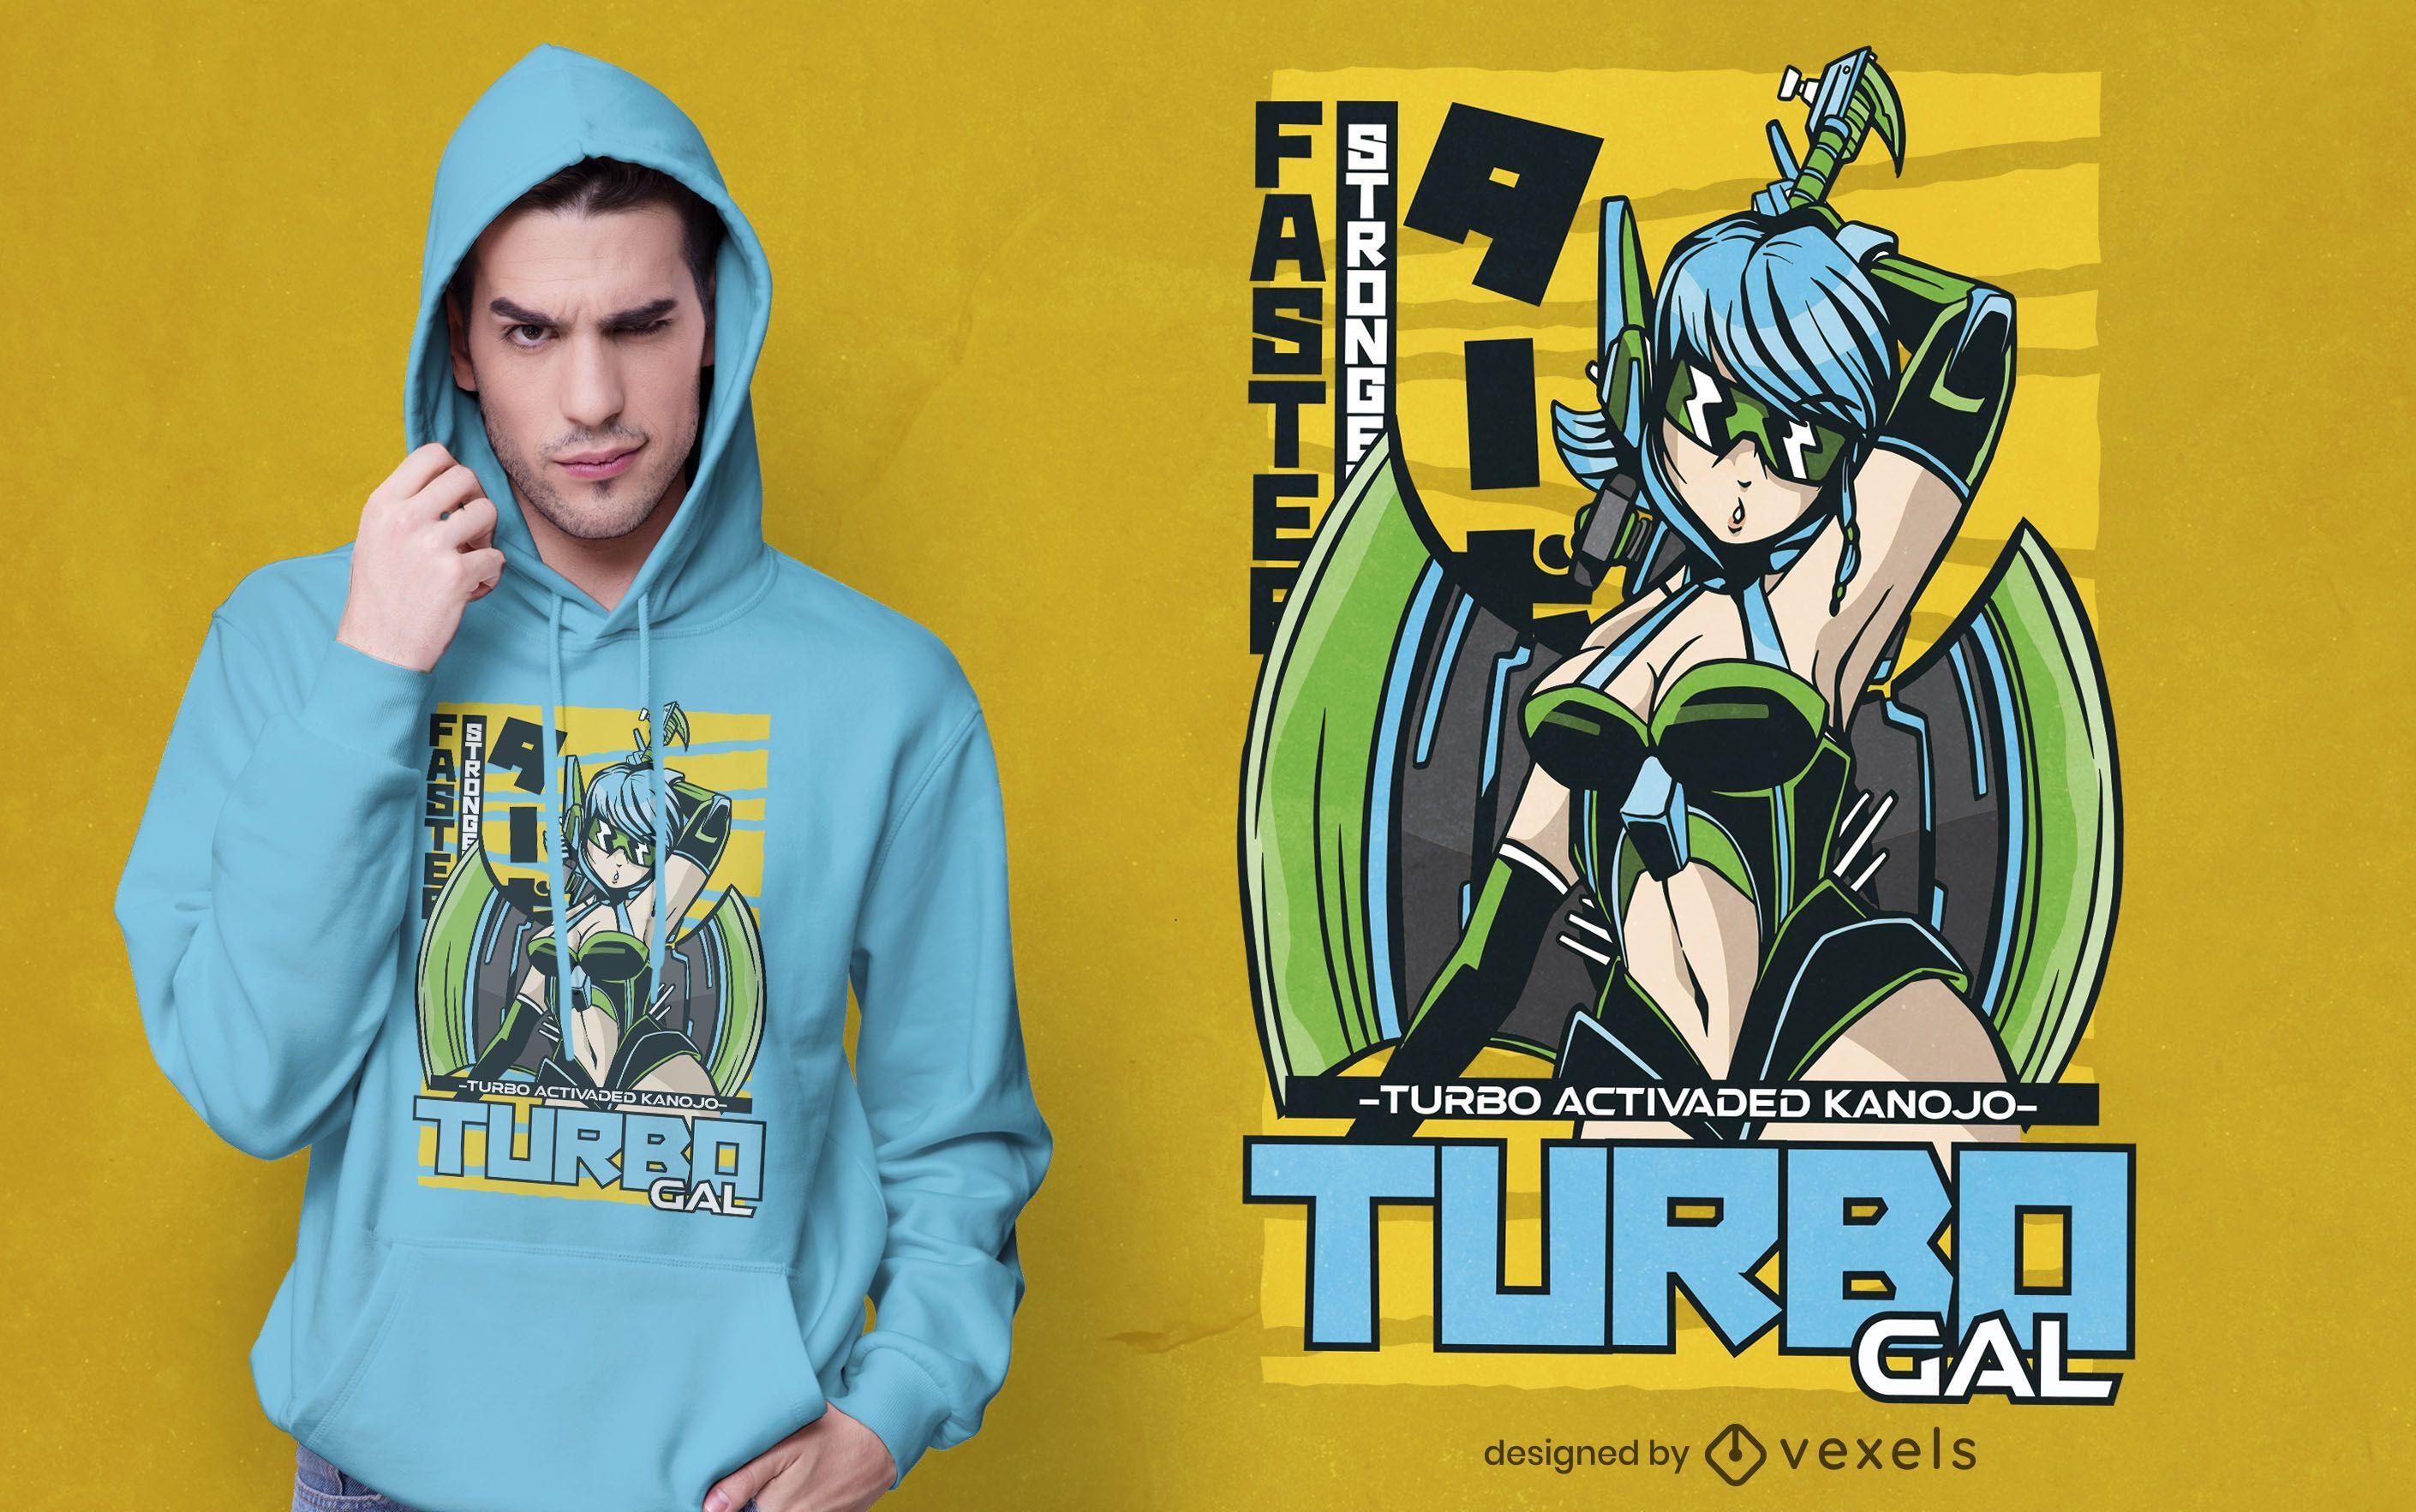 Turbo gal t-shirt design